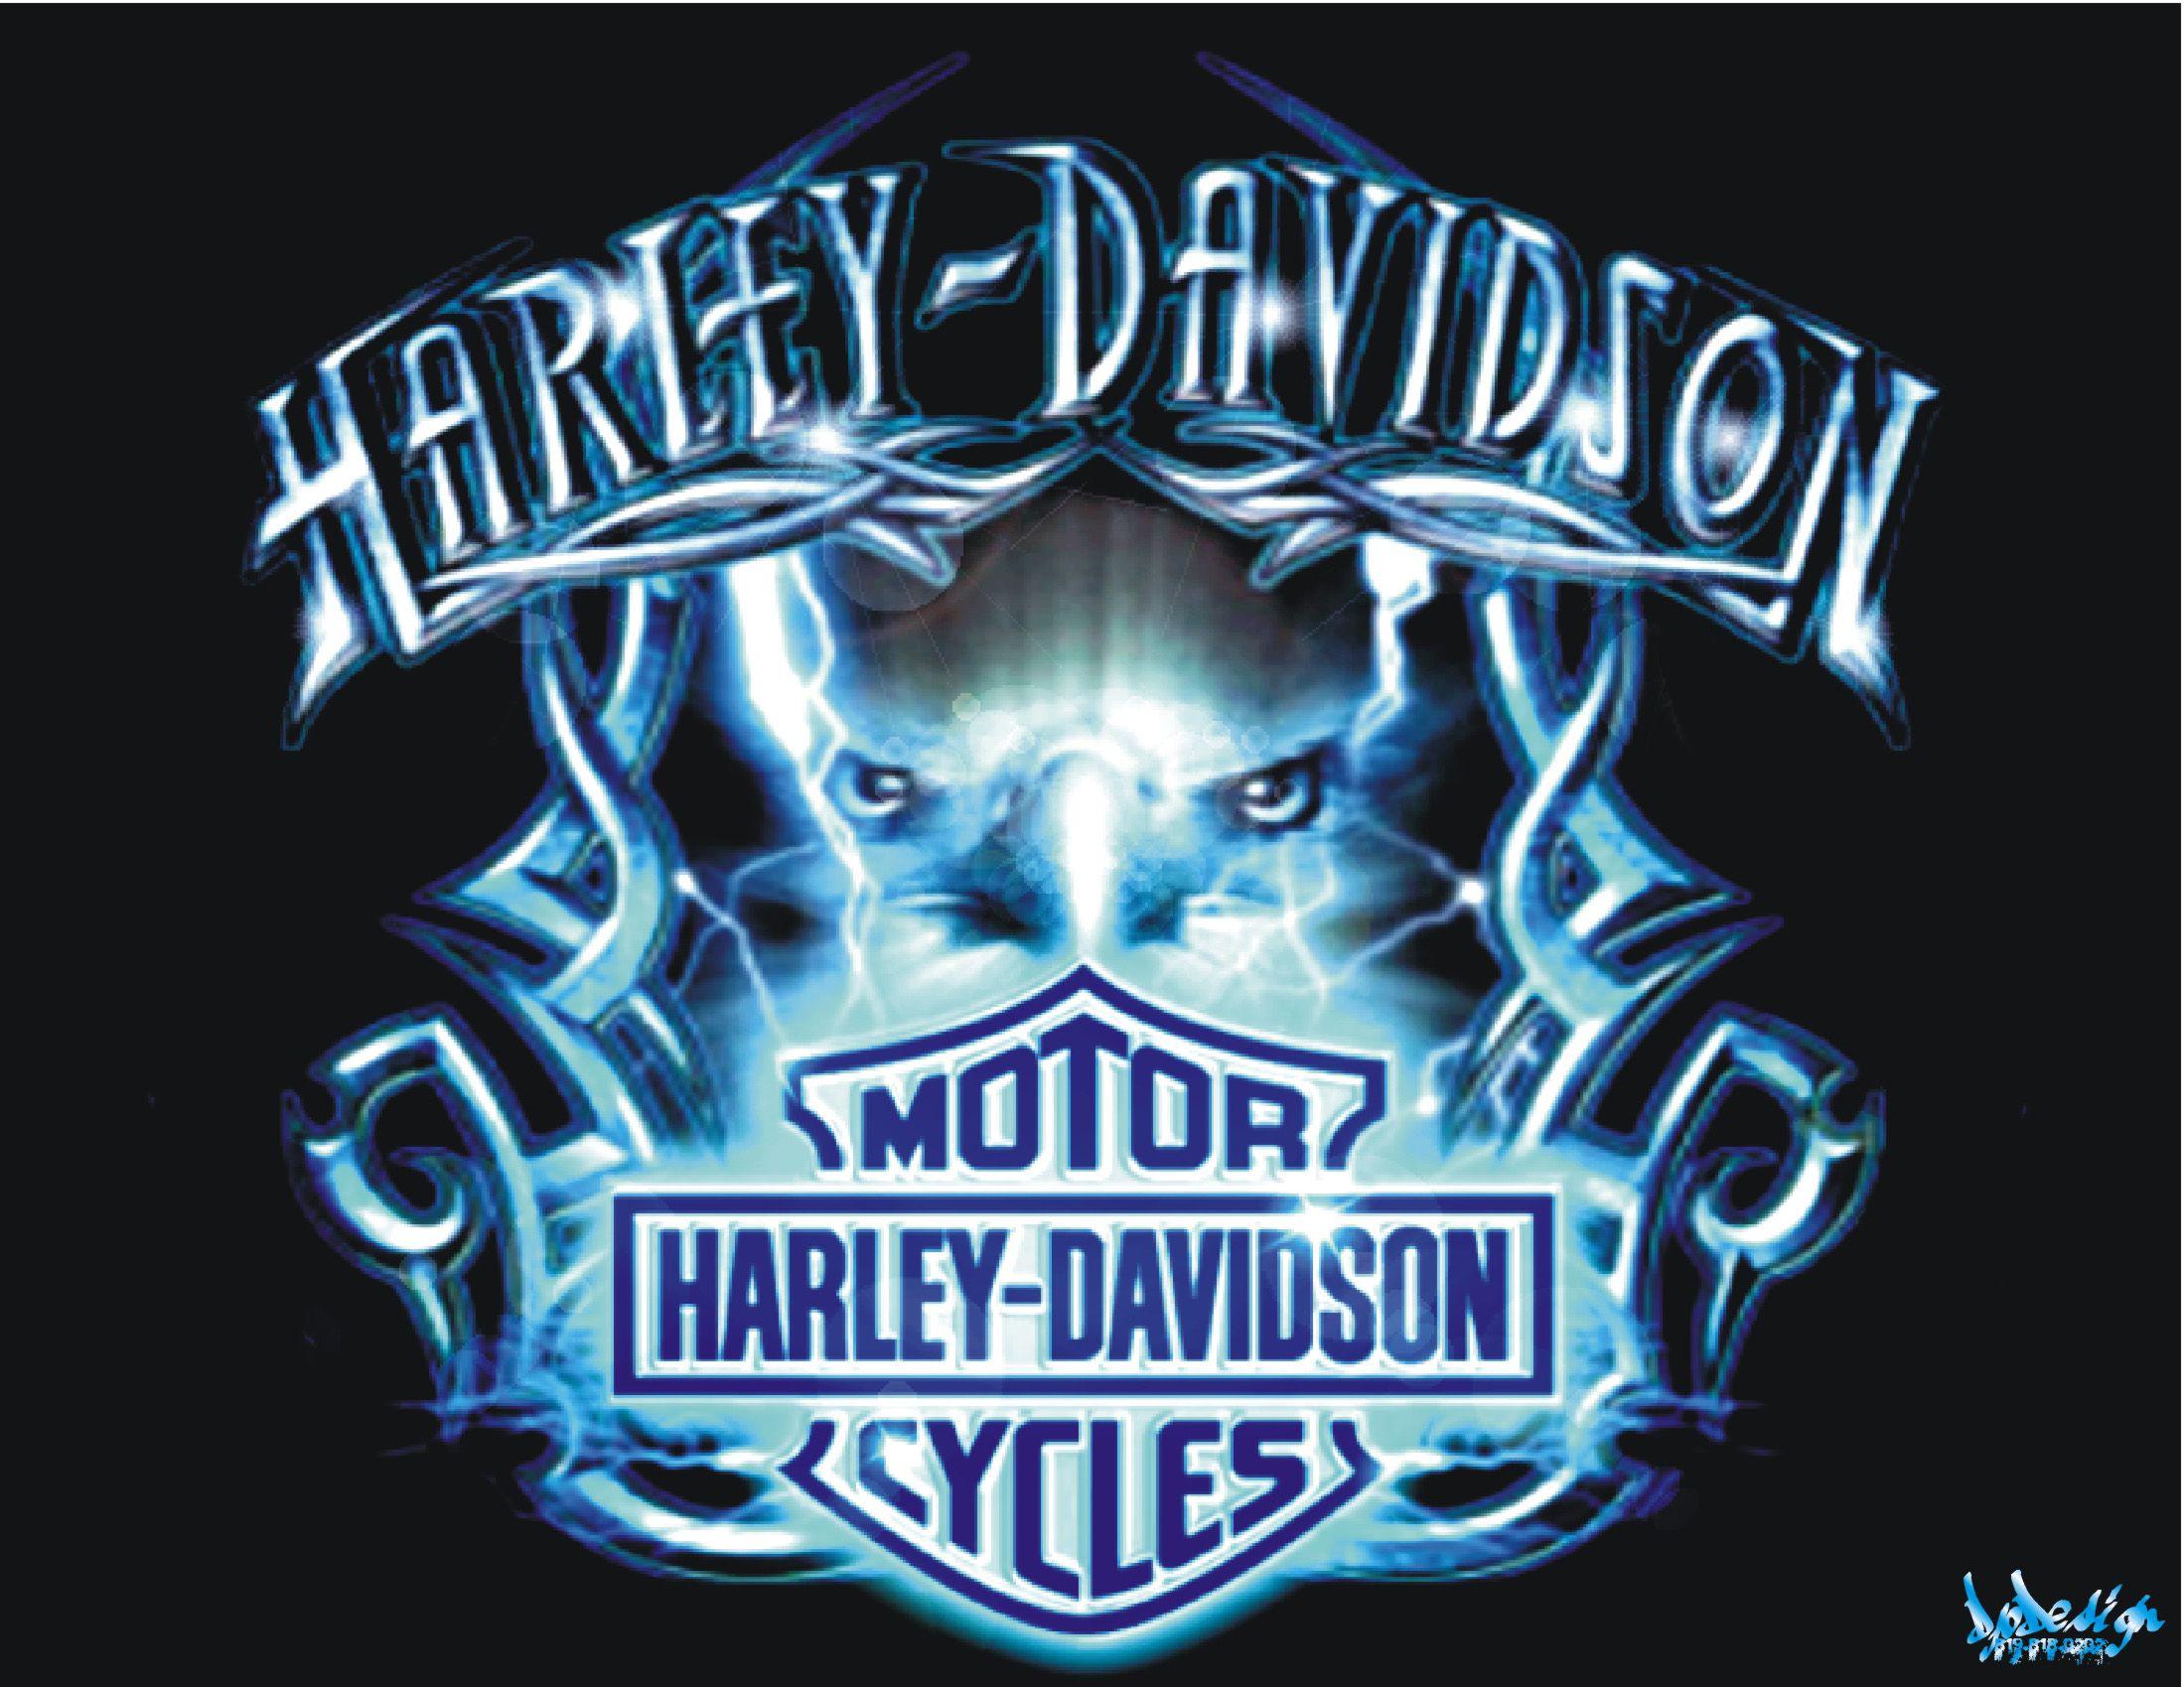 Harley davidson symbol harley stuff pinterest harley davidson symbol voltagebd Gallery